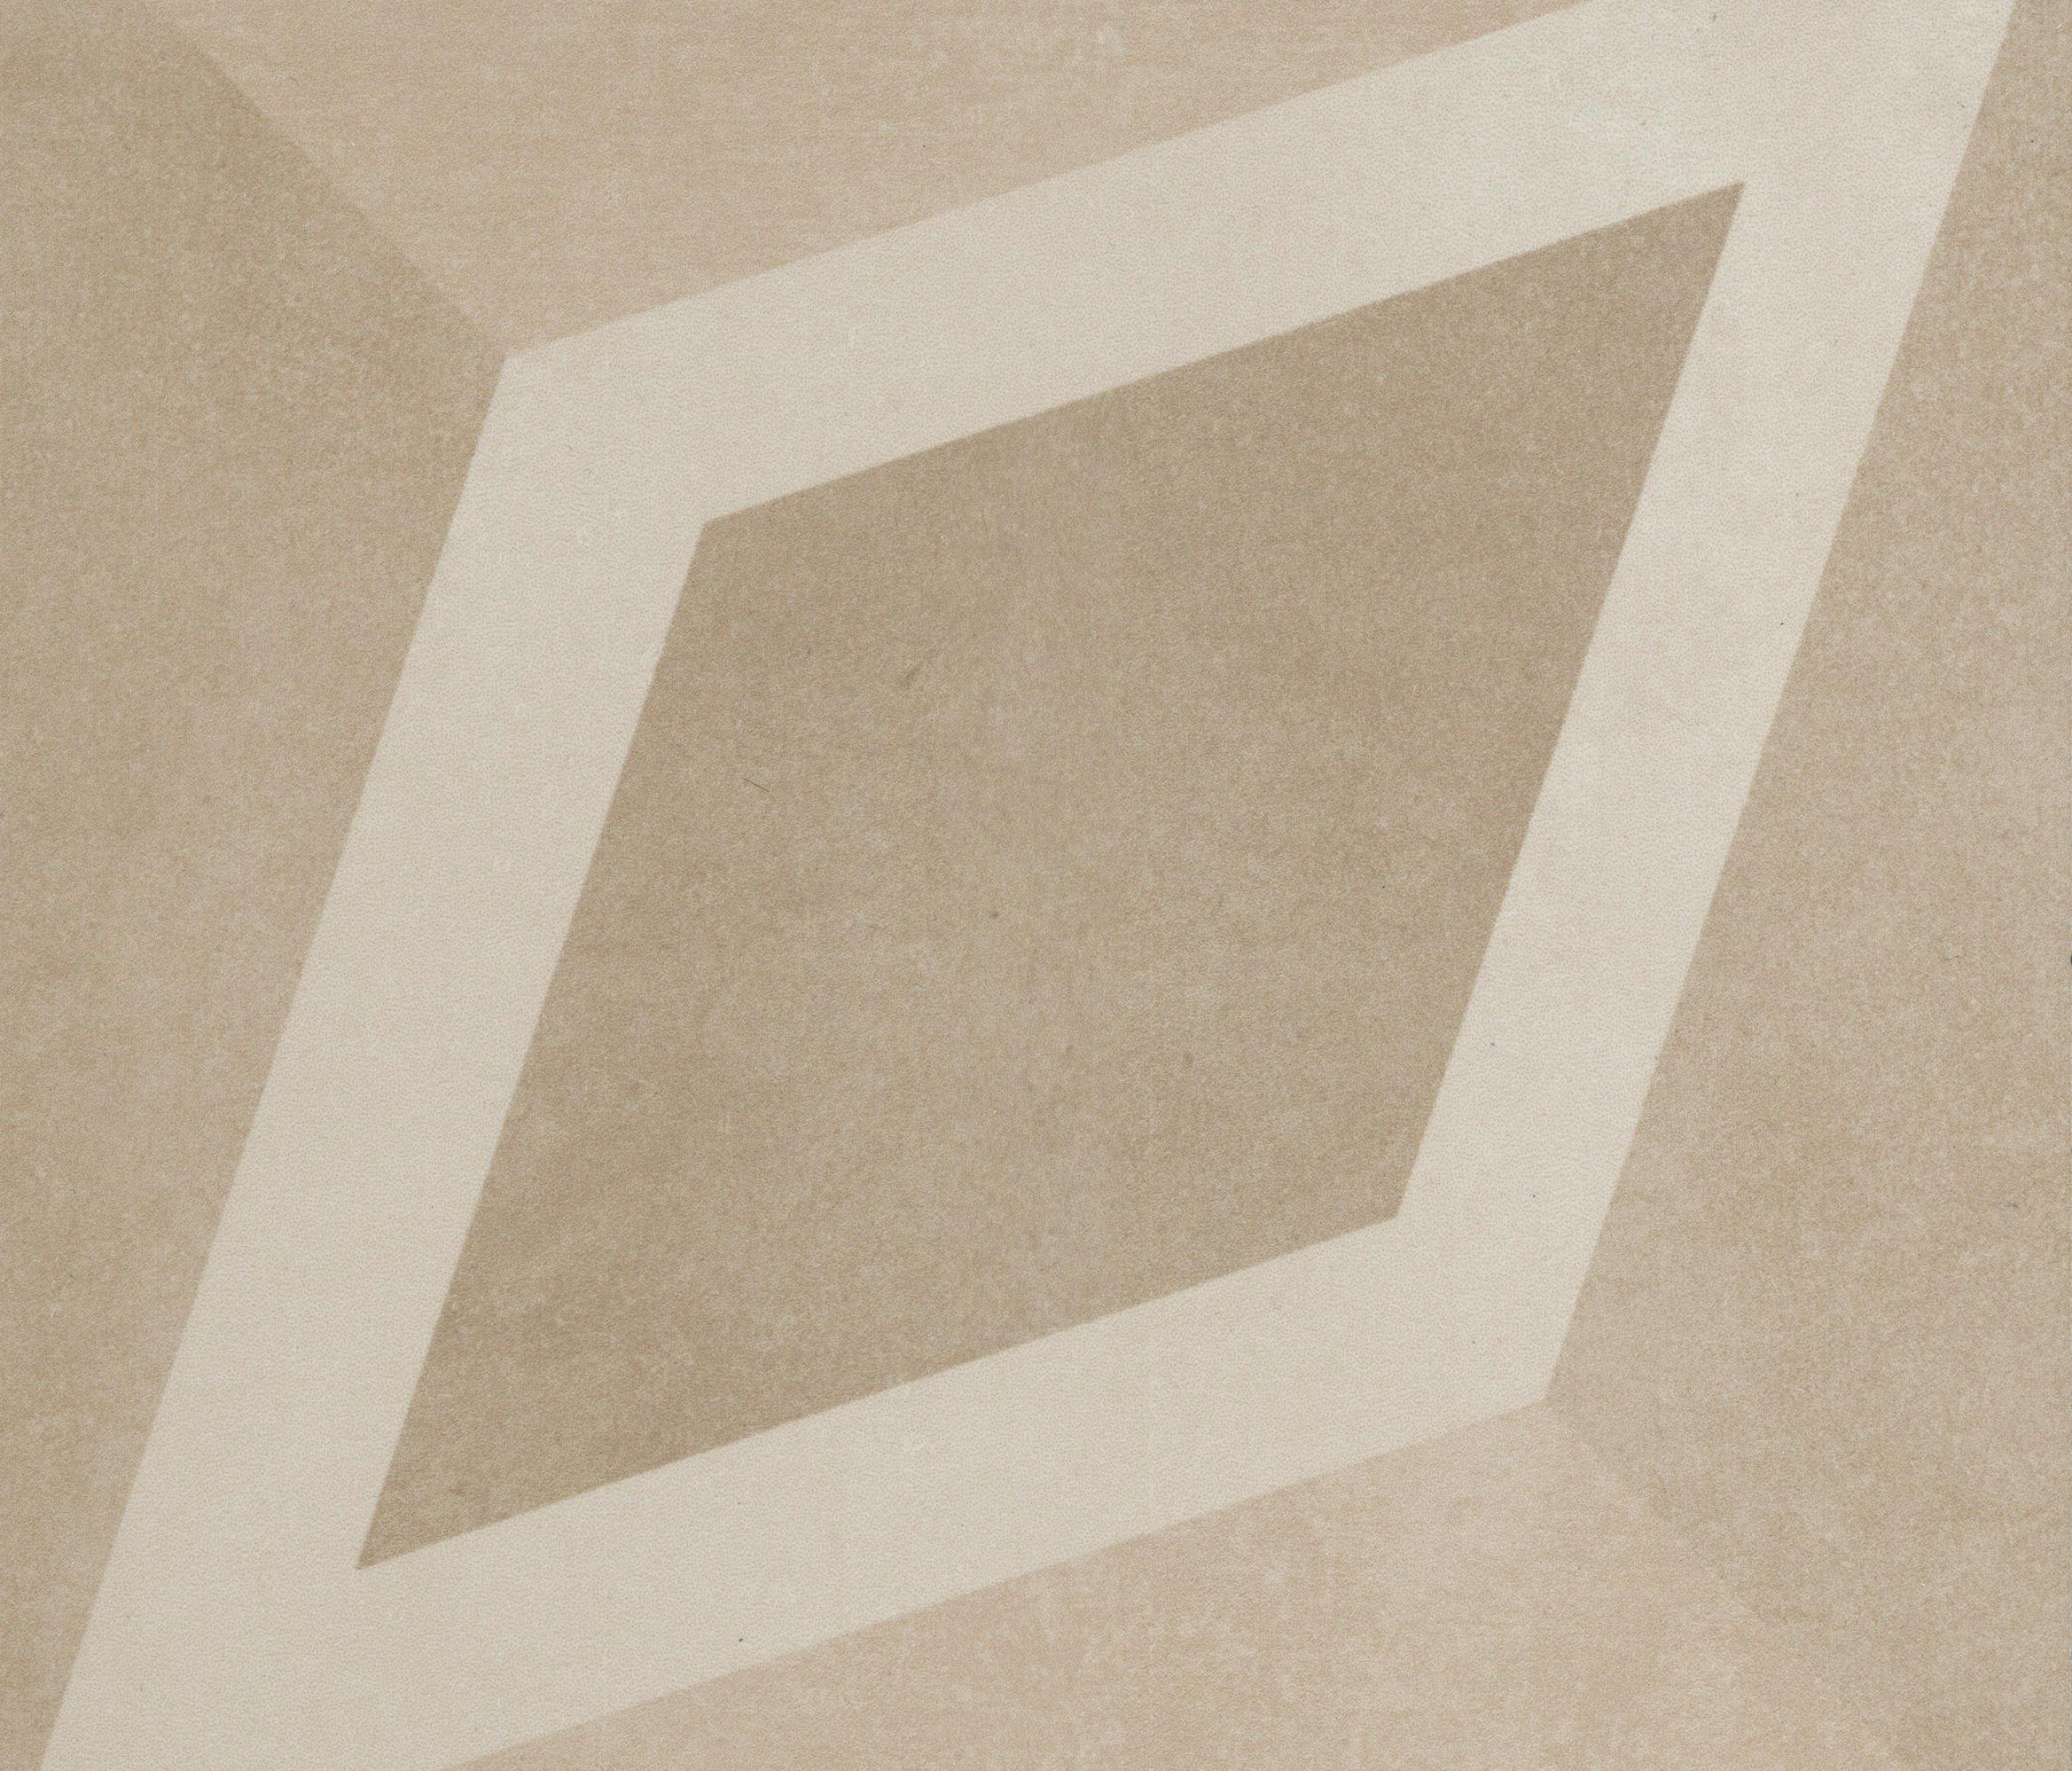 century unlimited cf1k tiles from villeroy boch. Black Bedroom Furniture Sets. Home Design Ideas